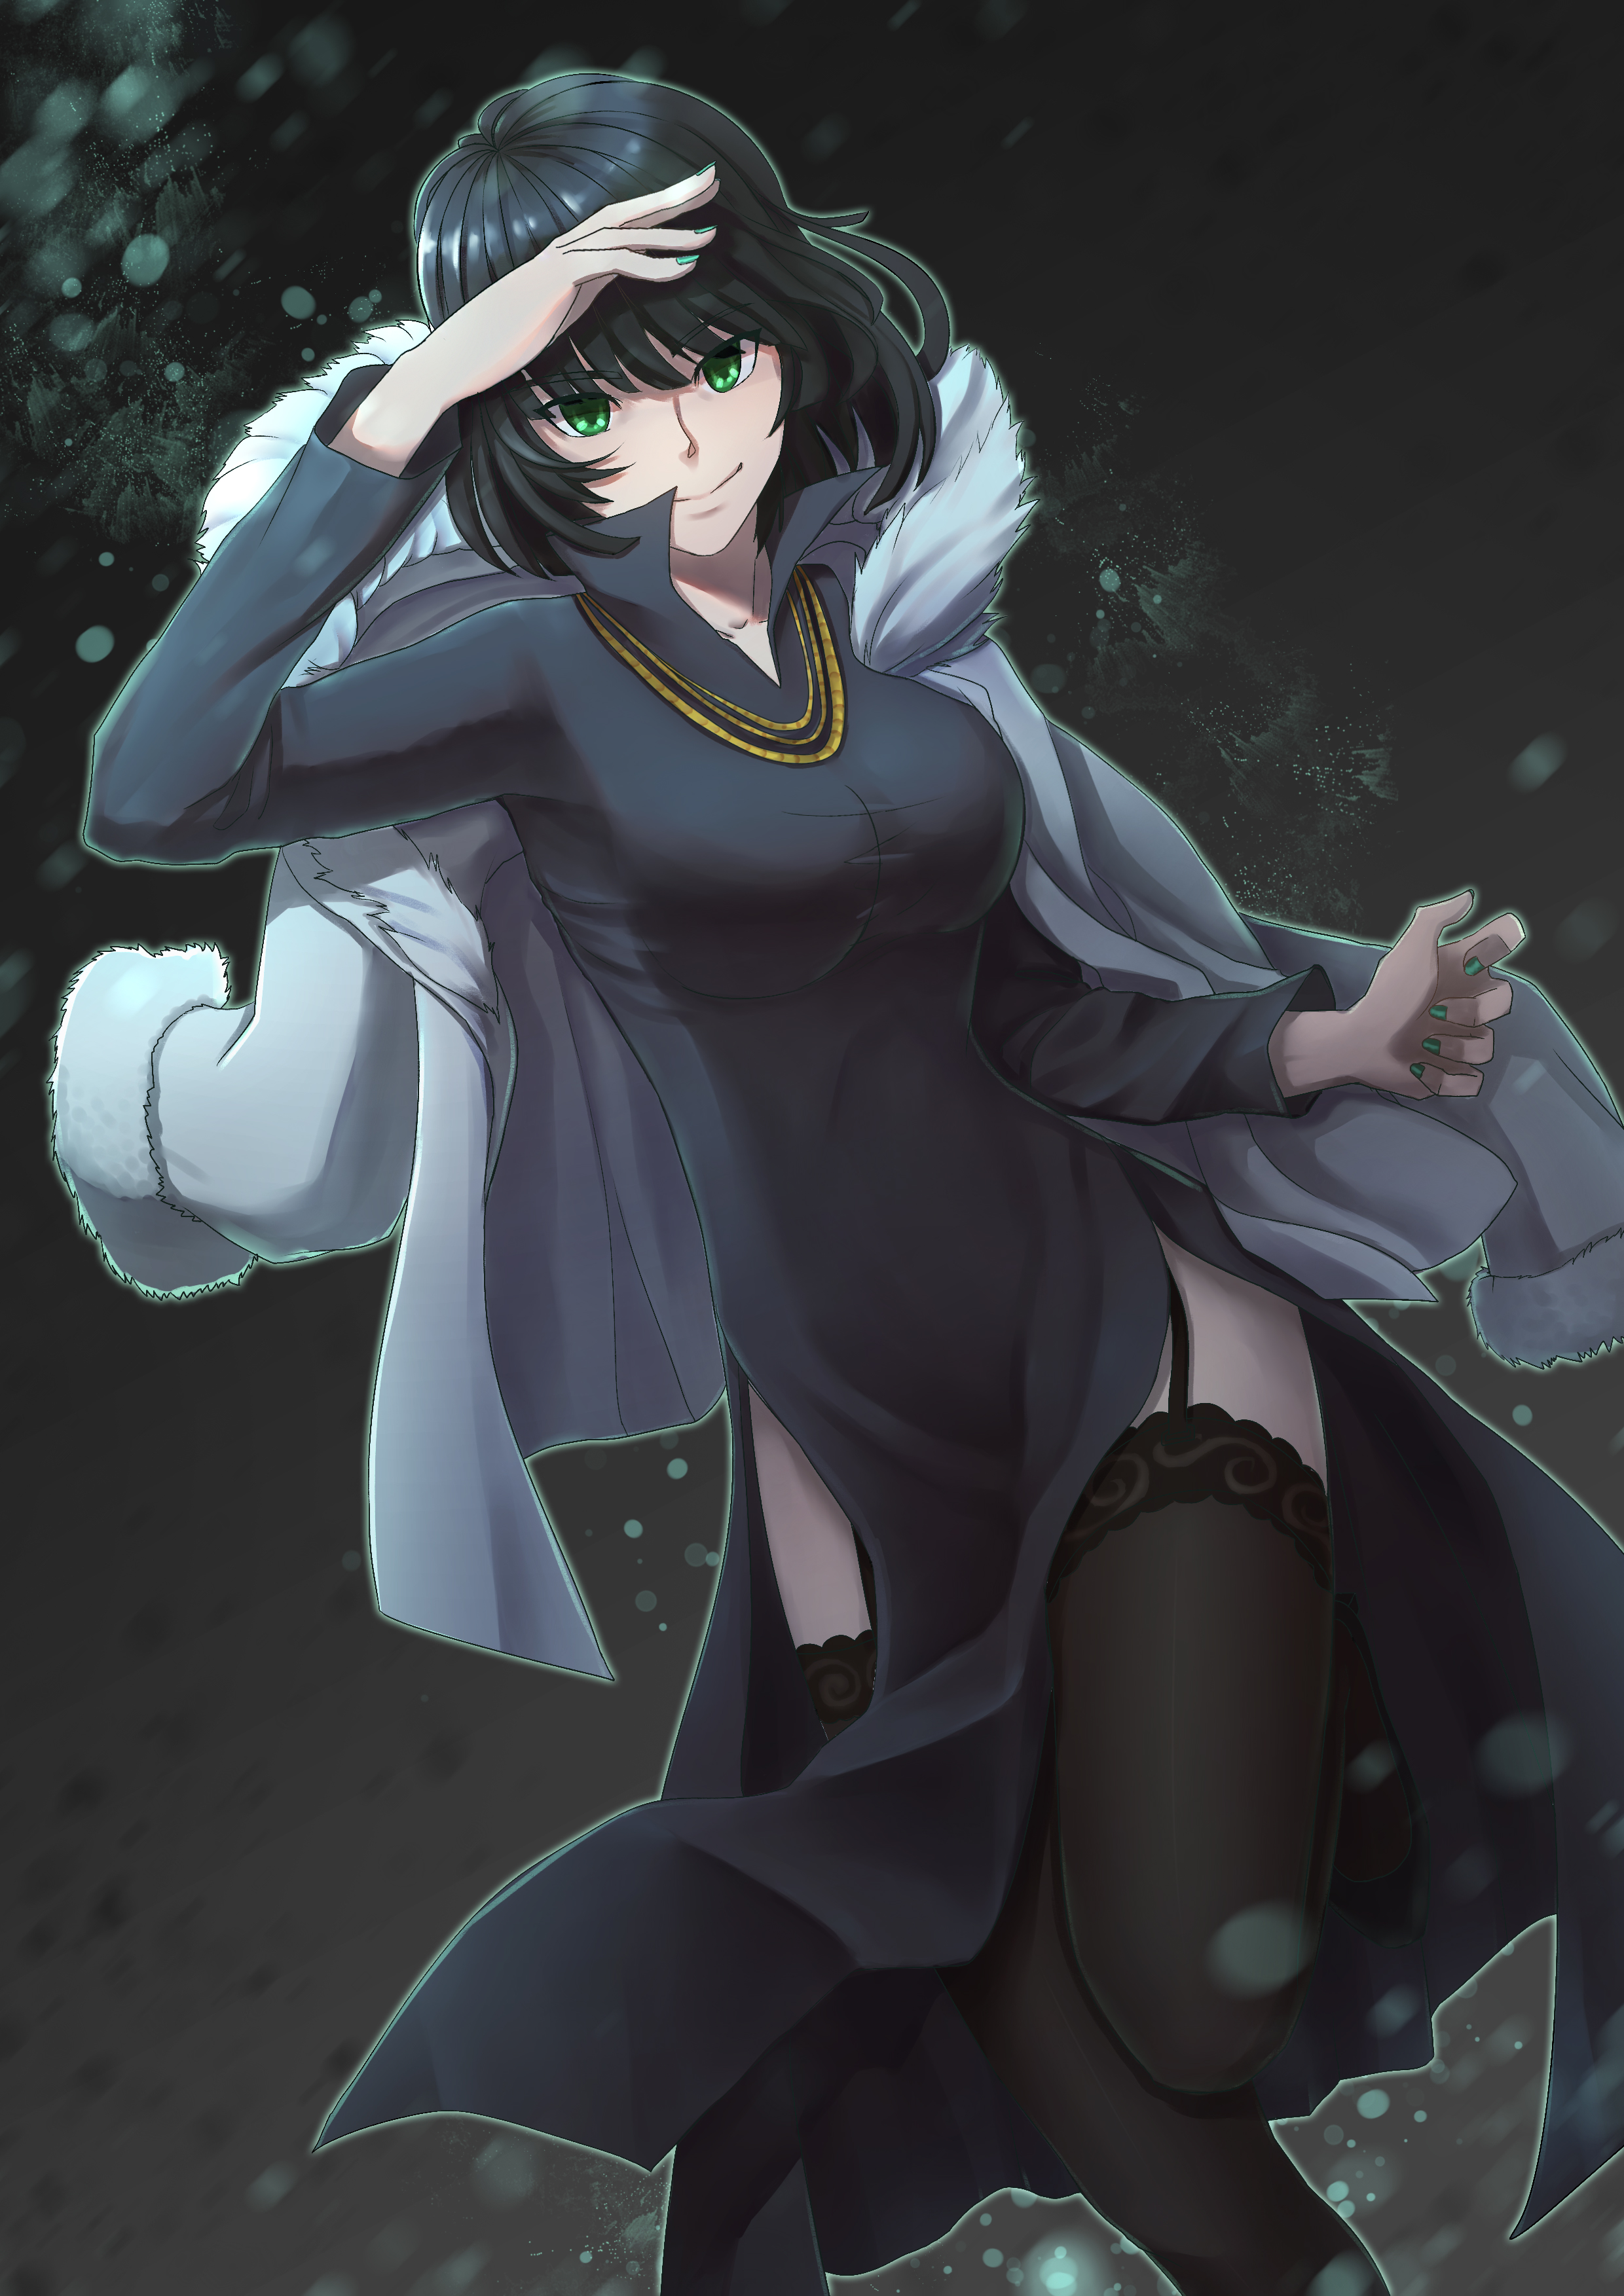 cosplay boobs Anime